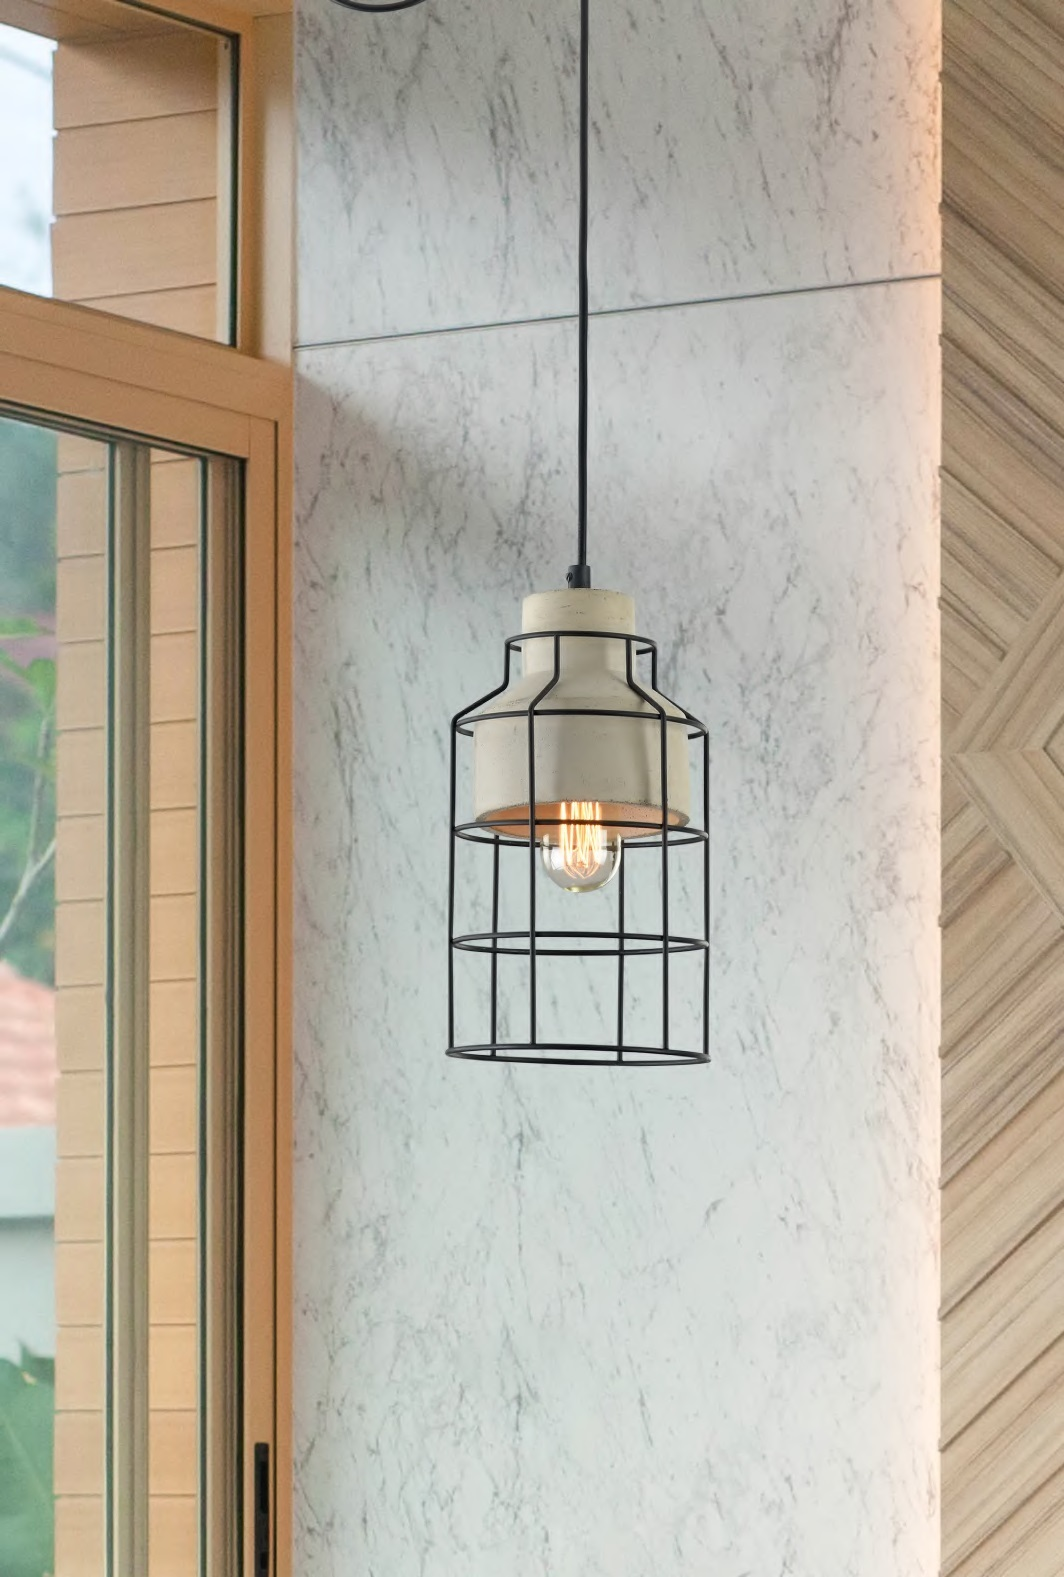 Подвесной светильник Maytoni Gosford T441-PL-01-GR, 1xE27x60W, черный, серый, металл, бетон - фото 5